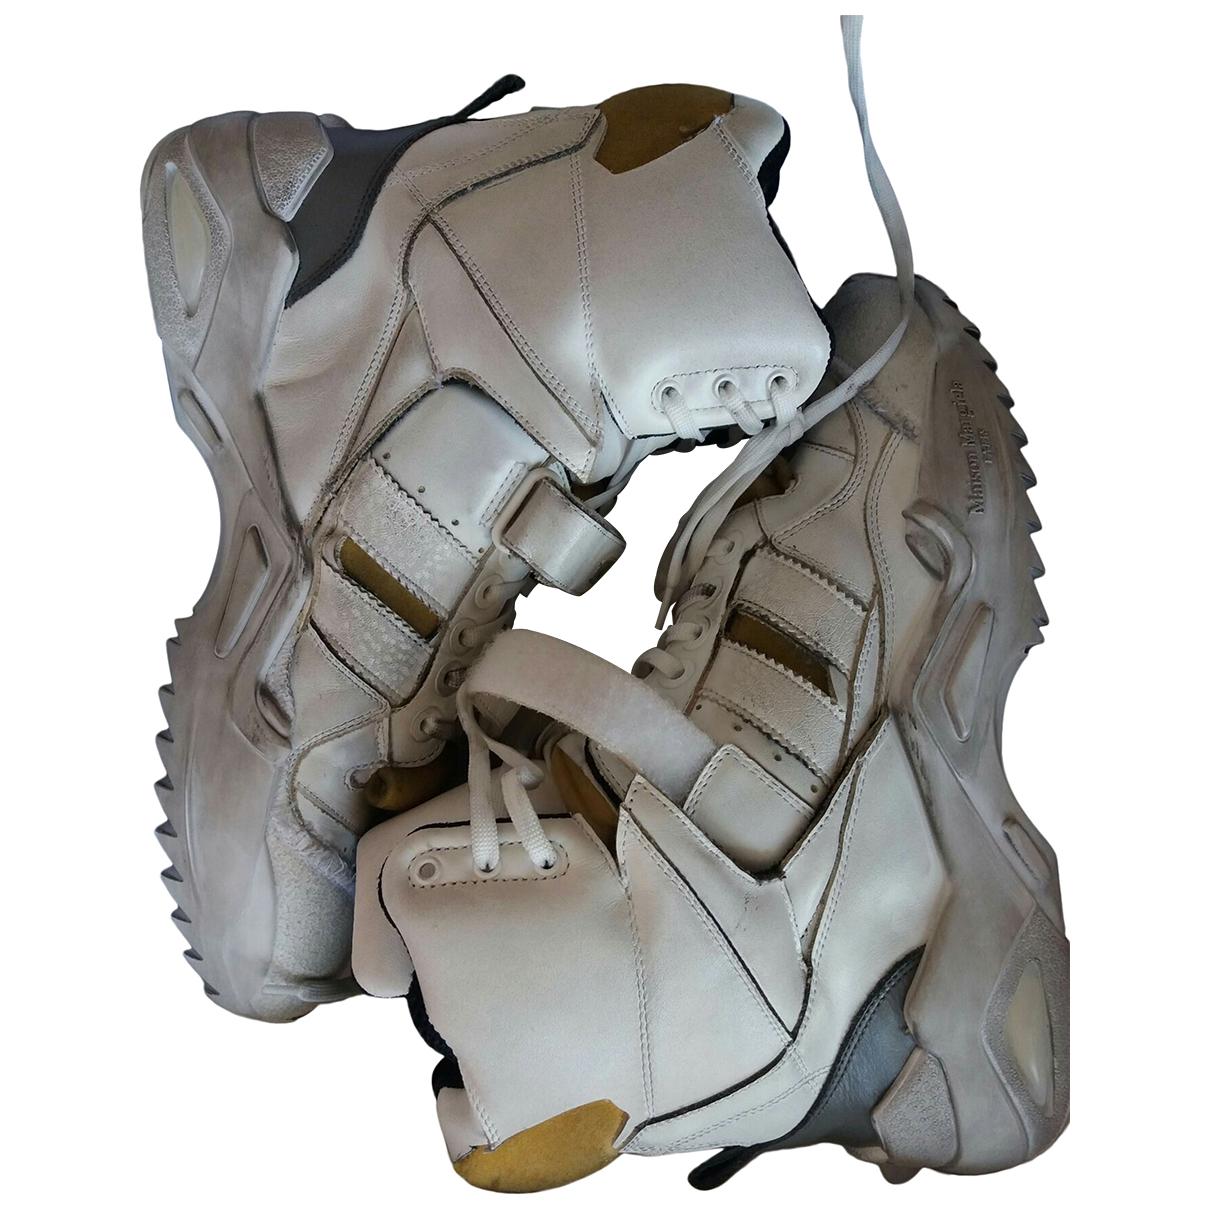 Maison Martin Margiela Retro Fit White Leather Trainers for Men 42 EU